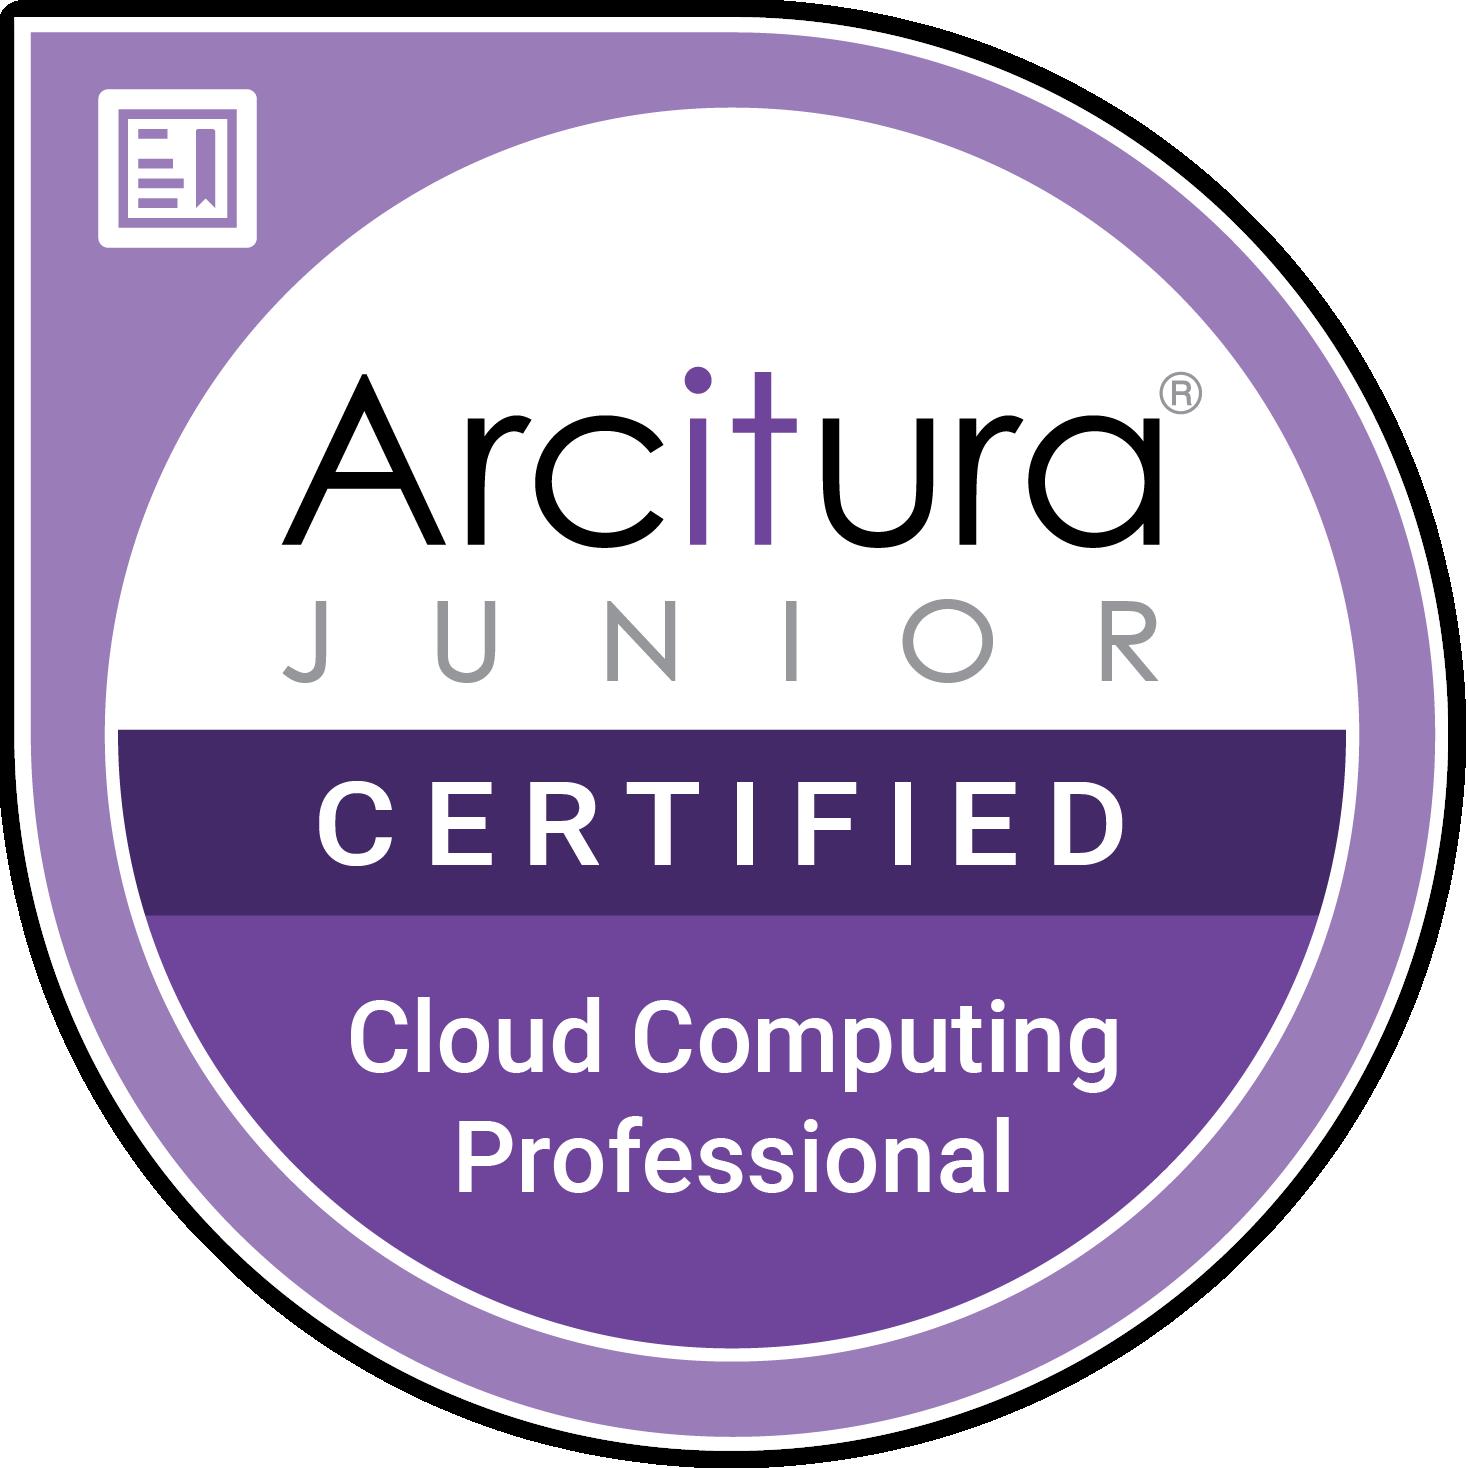 Junior Cloud Computing Professional